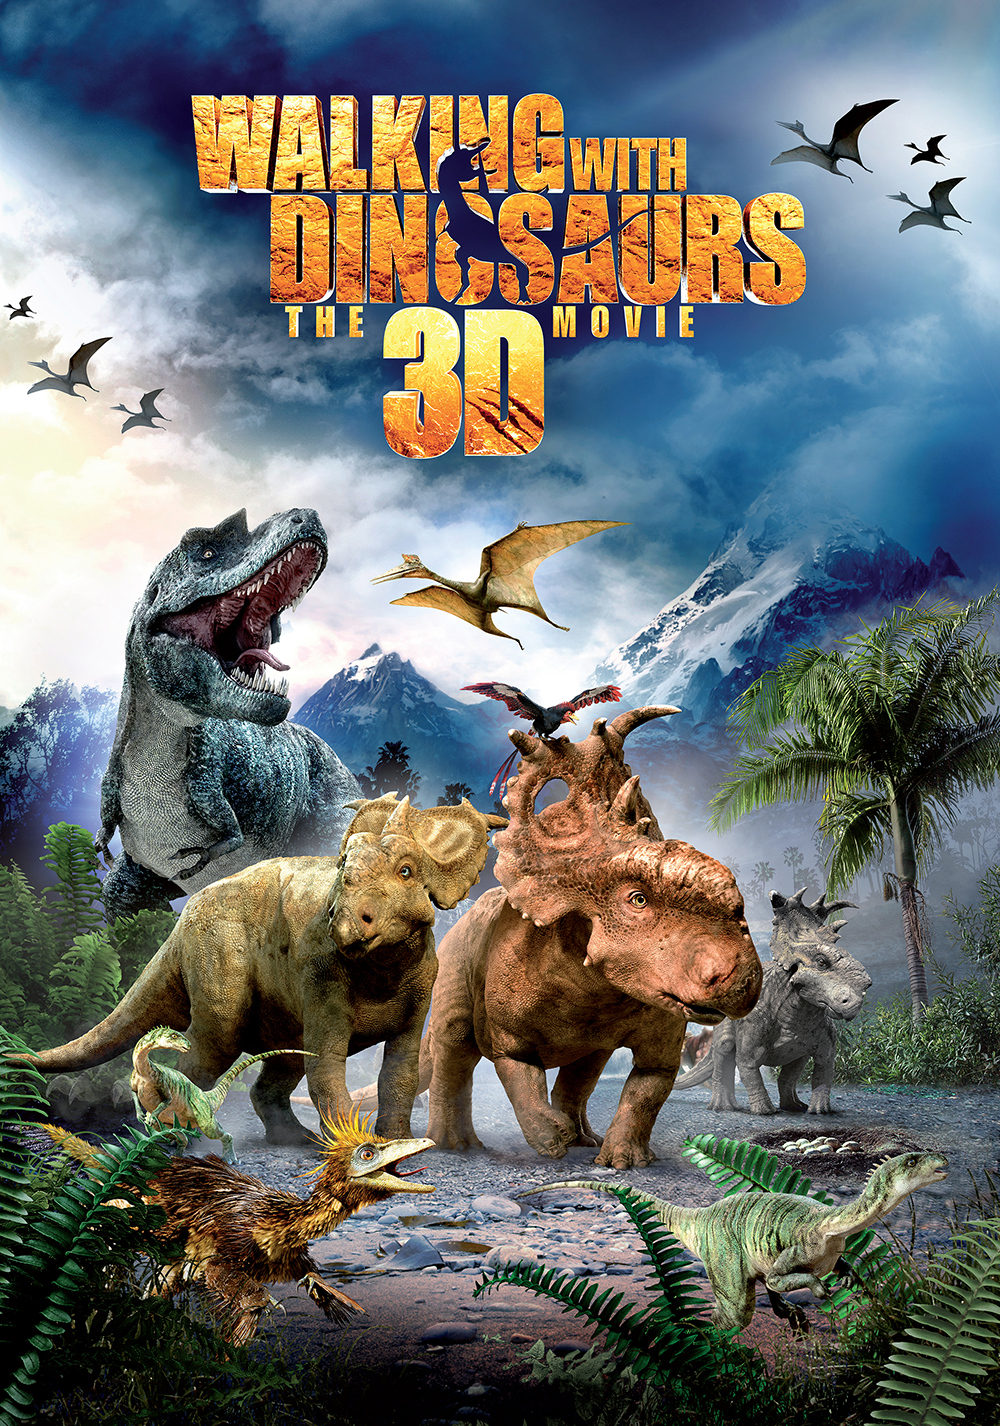 walking-with-dinosaurs-52dab8077af48.jpg